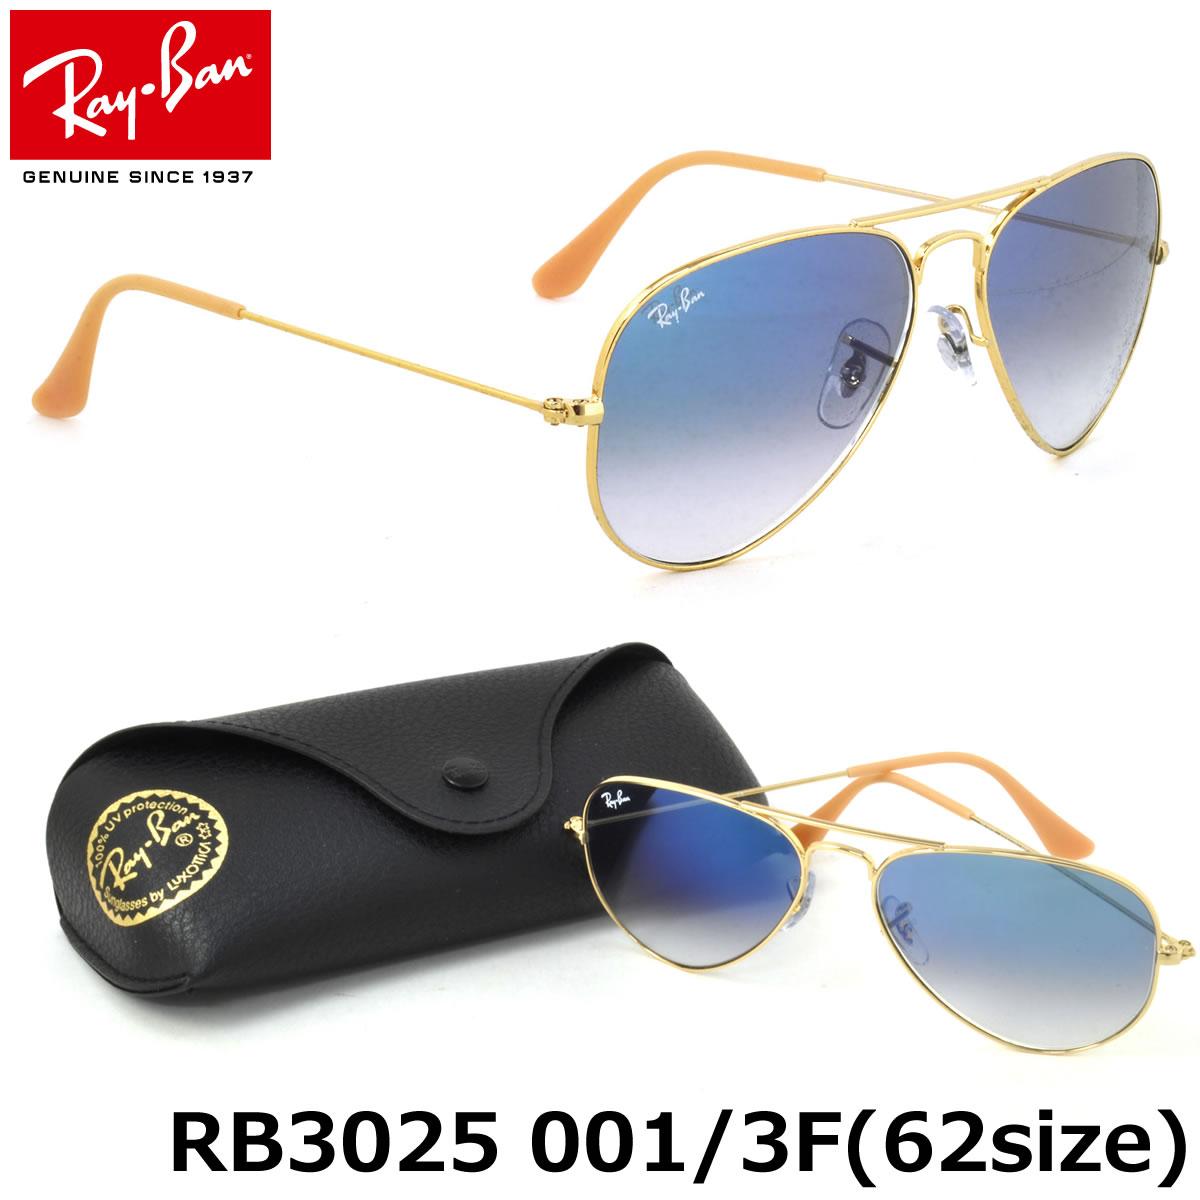 44ed918d13e13 Ray-Ban RB3025